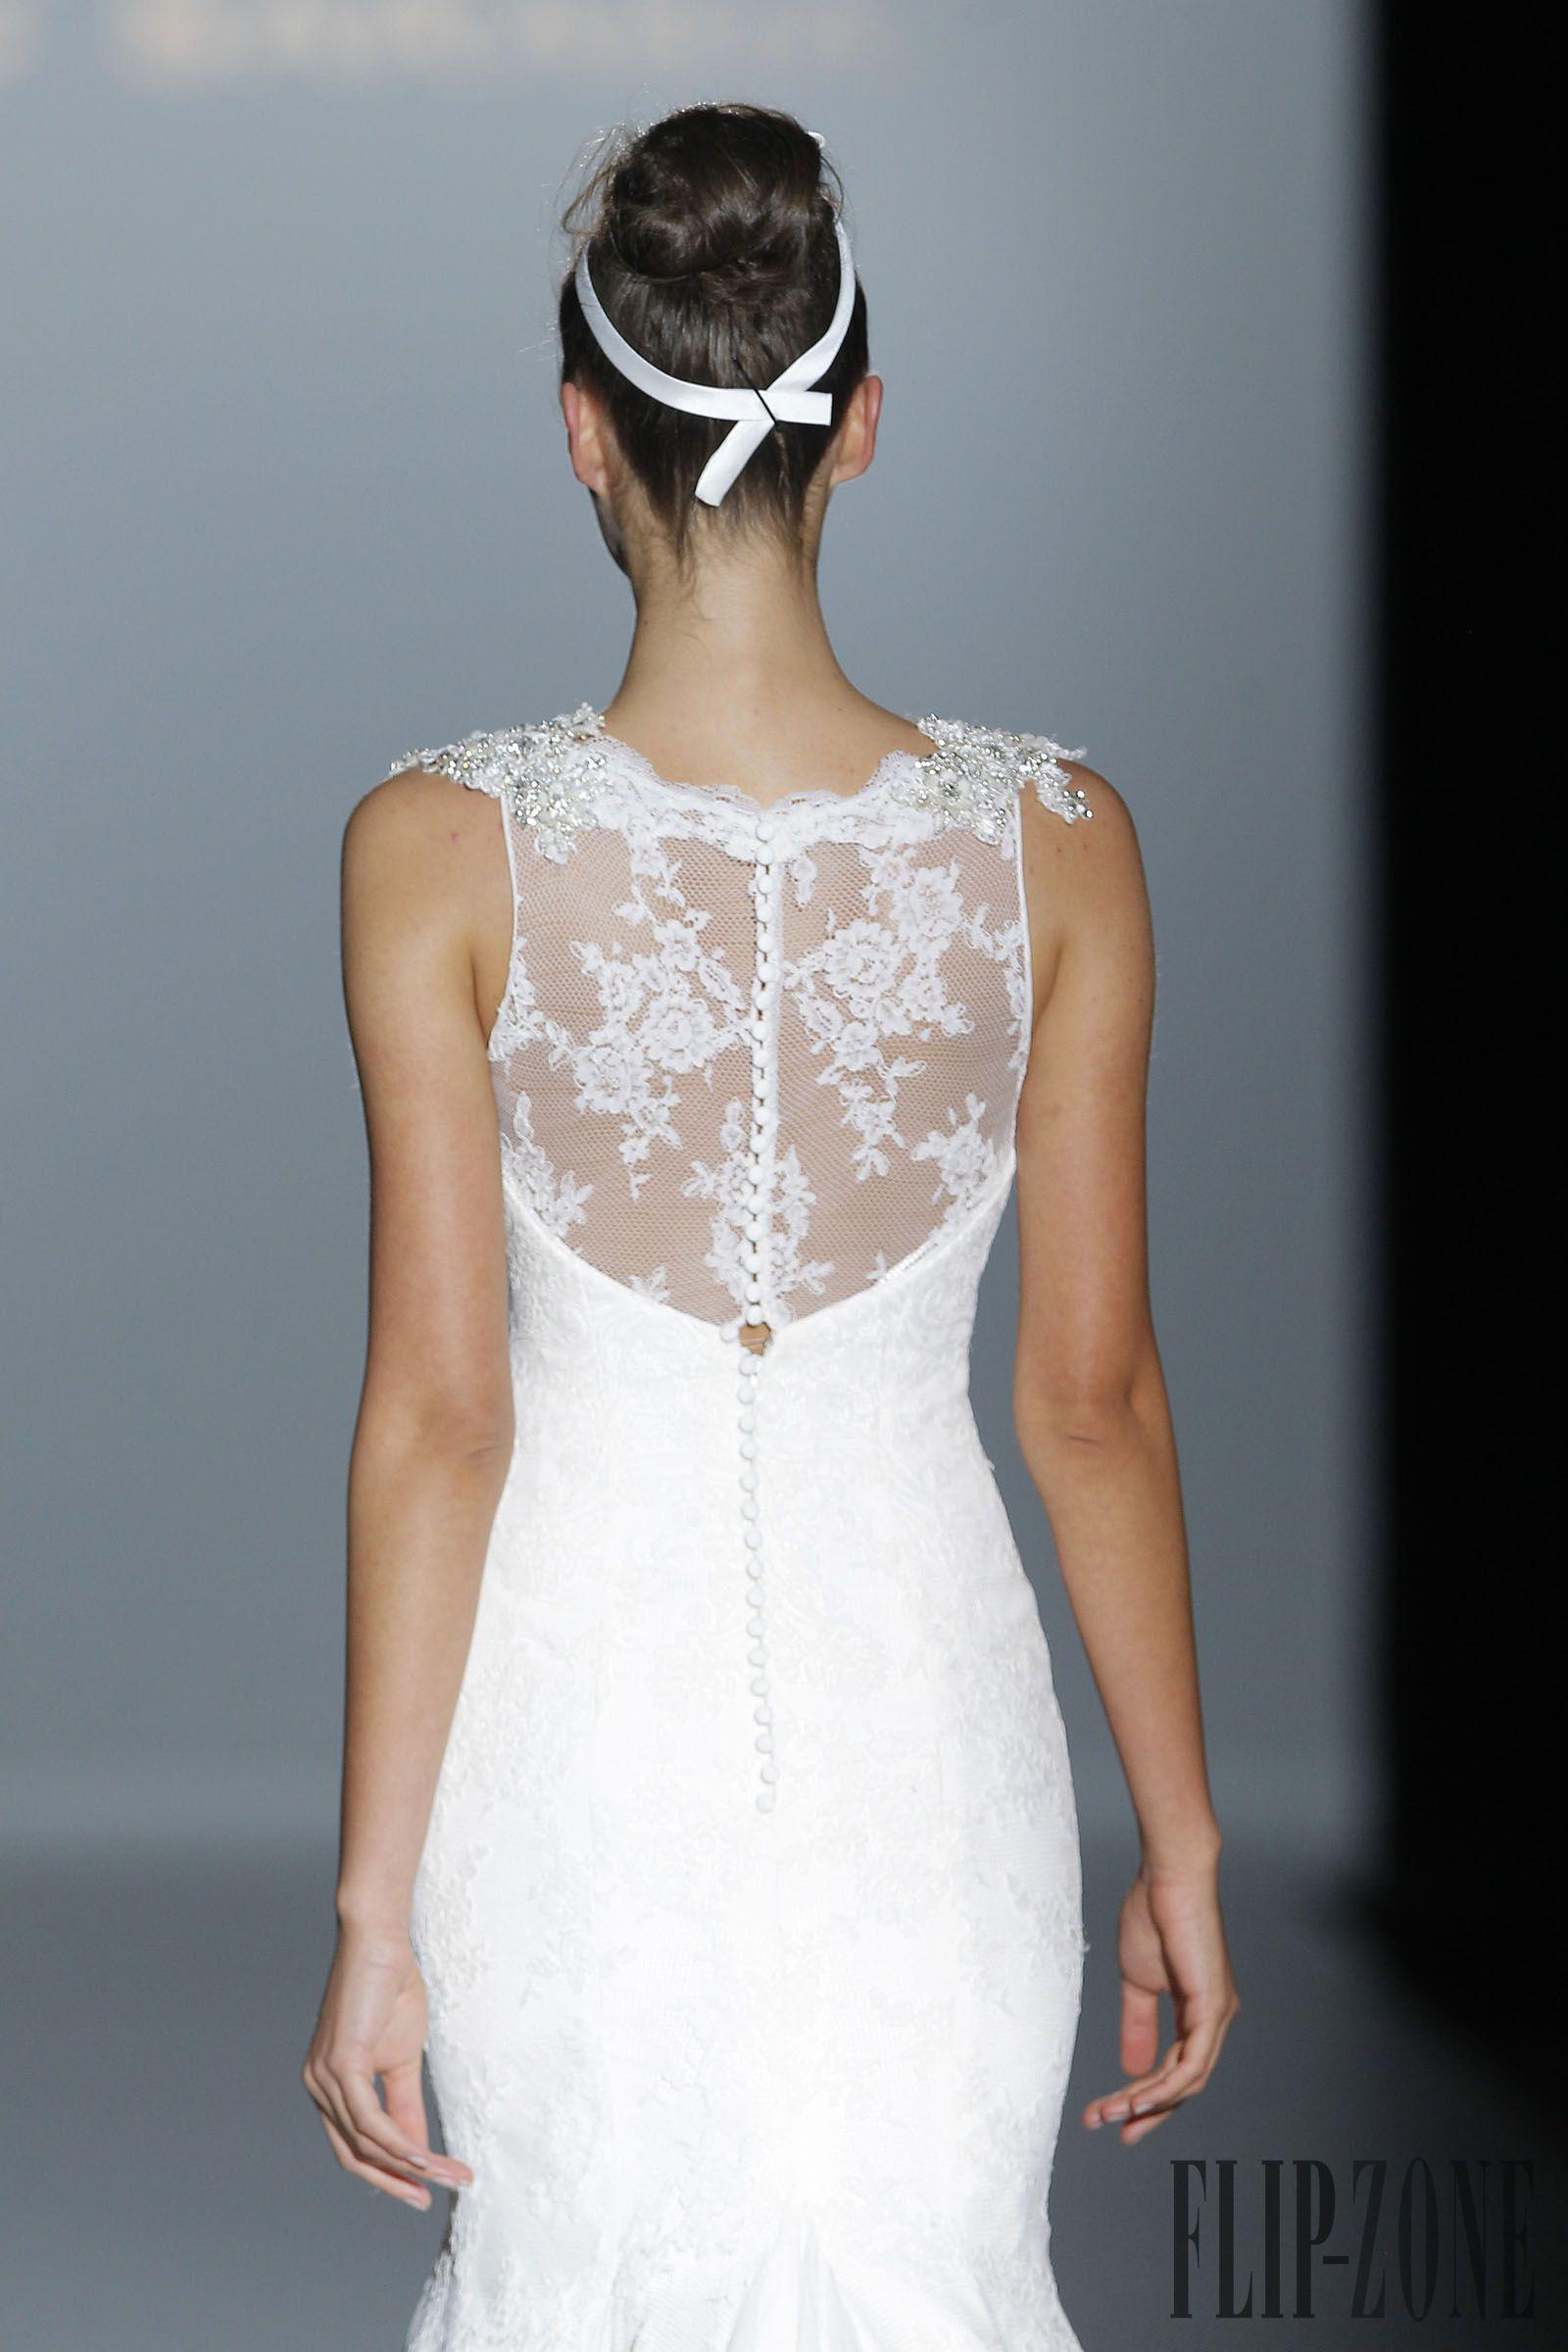 Franc Sarabia 2015 collection - Bridal - http://www.flip-zone.com/fashion/bridal/the-bride/franc-sarabia-4751